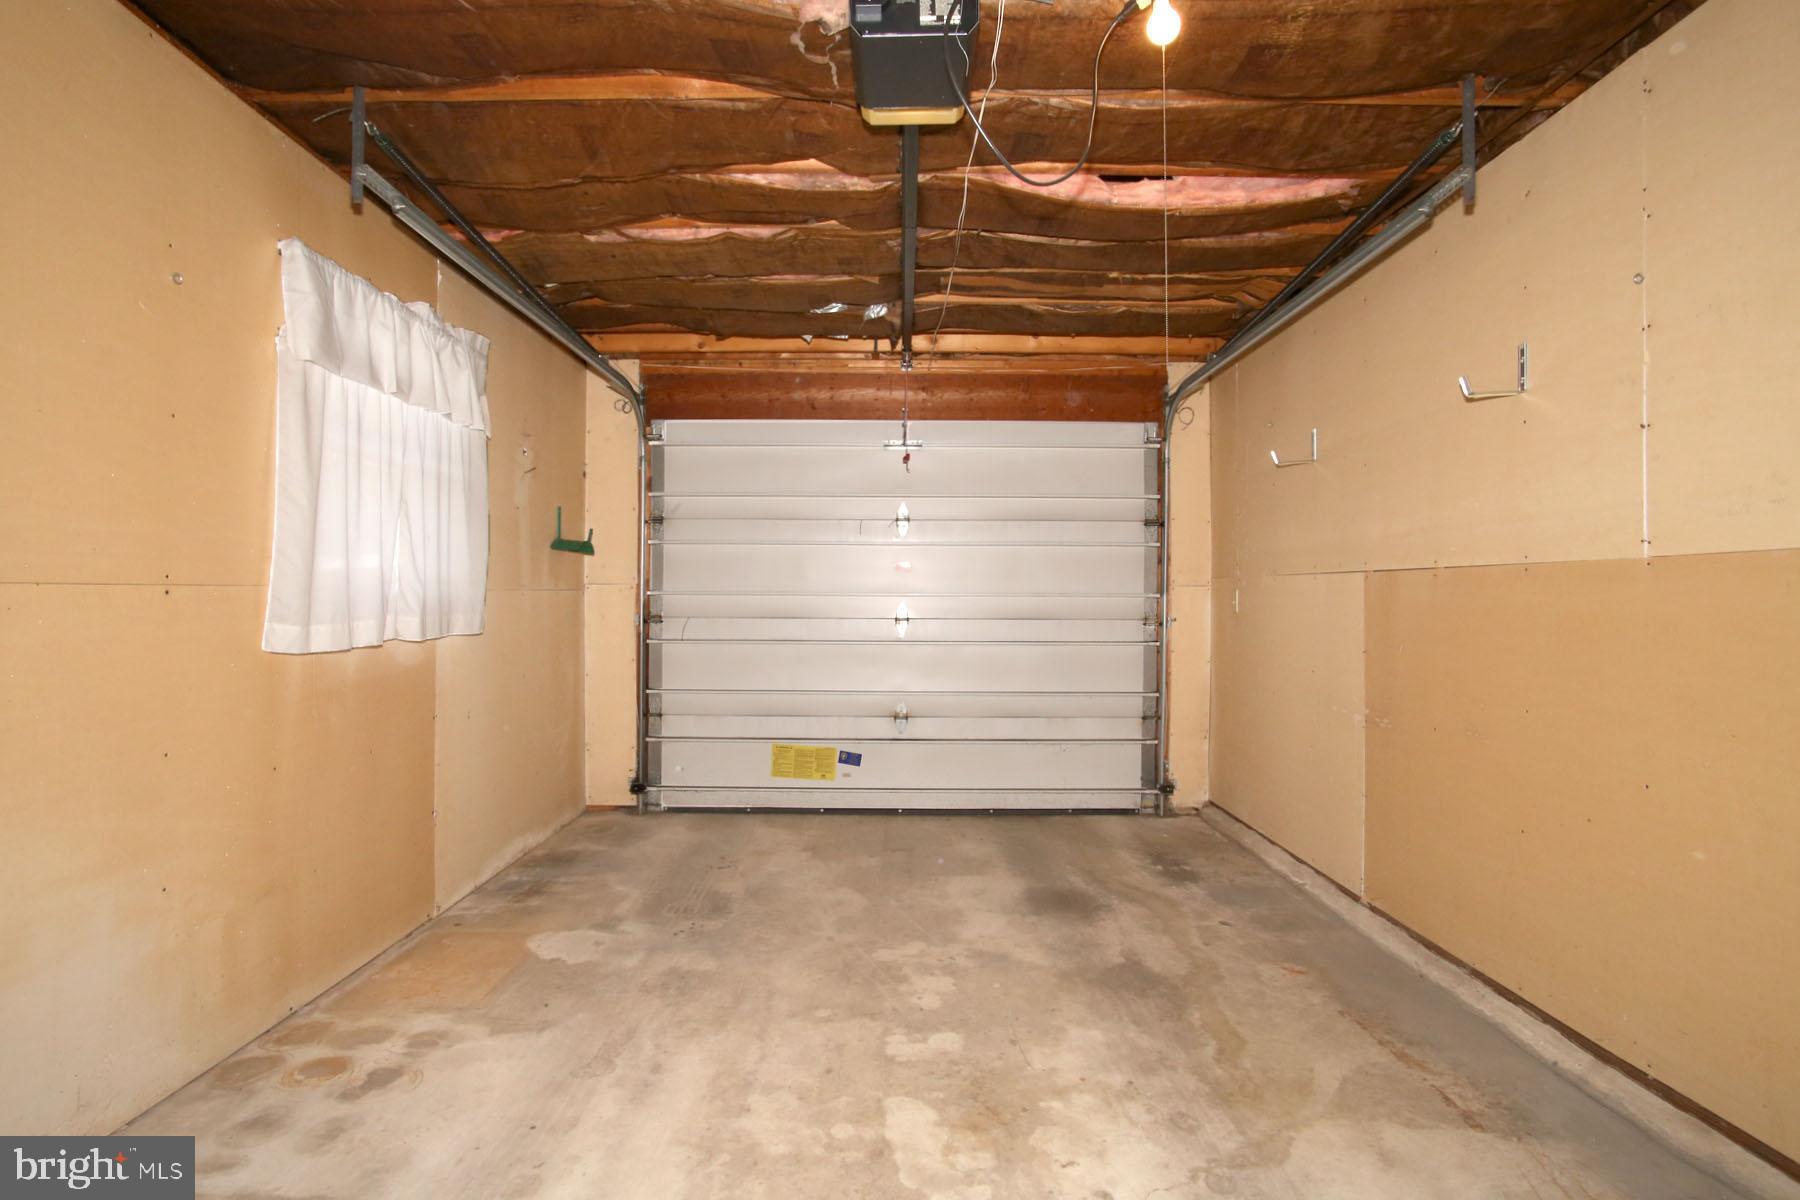 Easy access integral garage